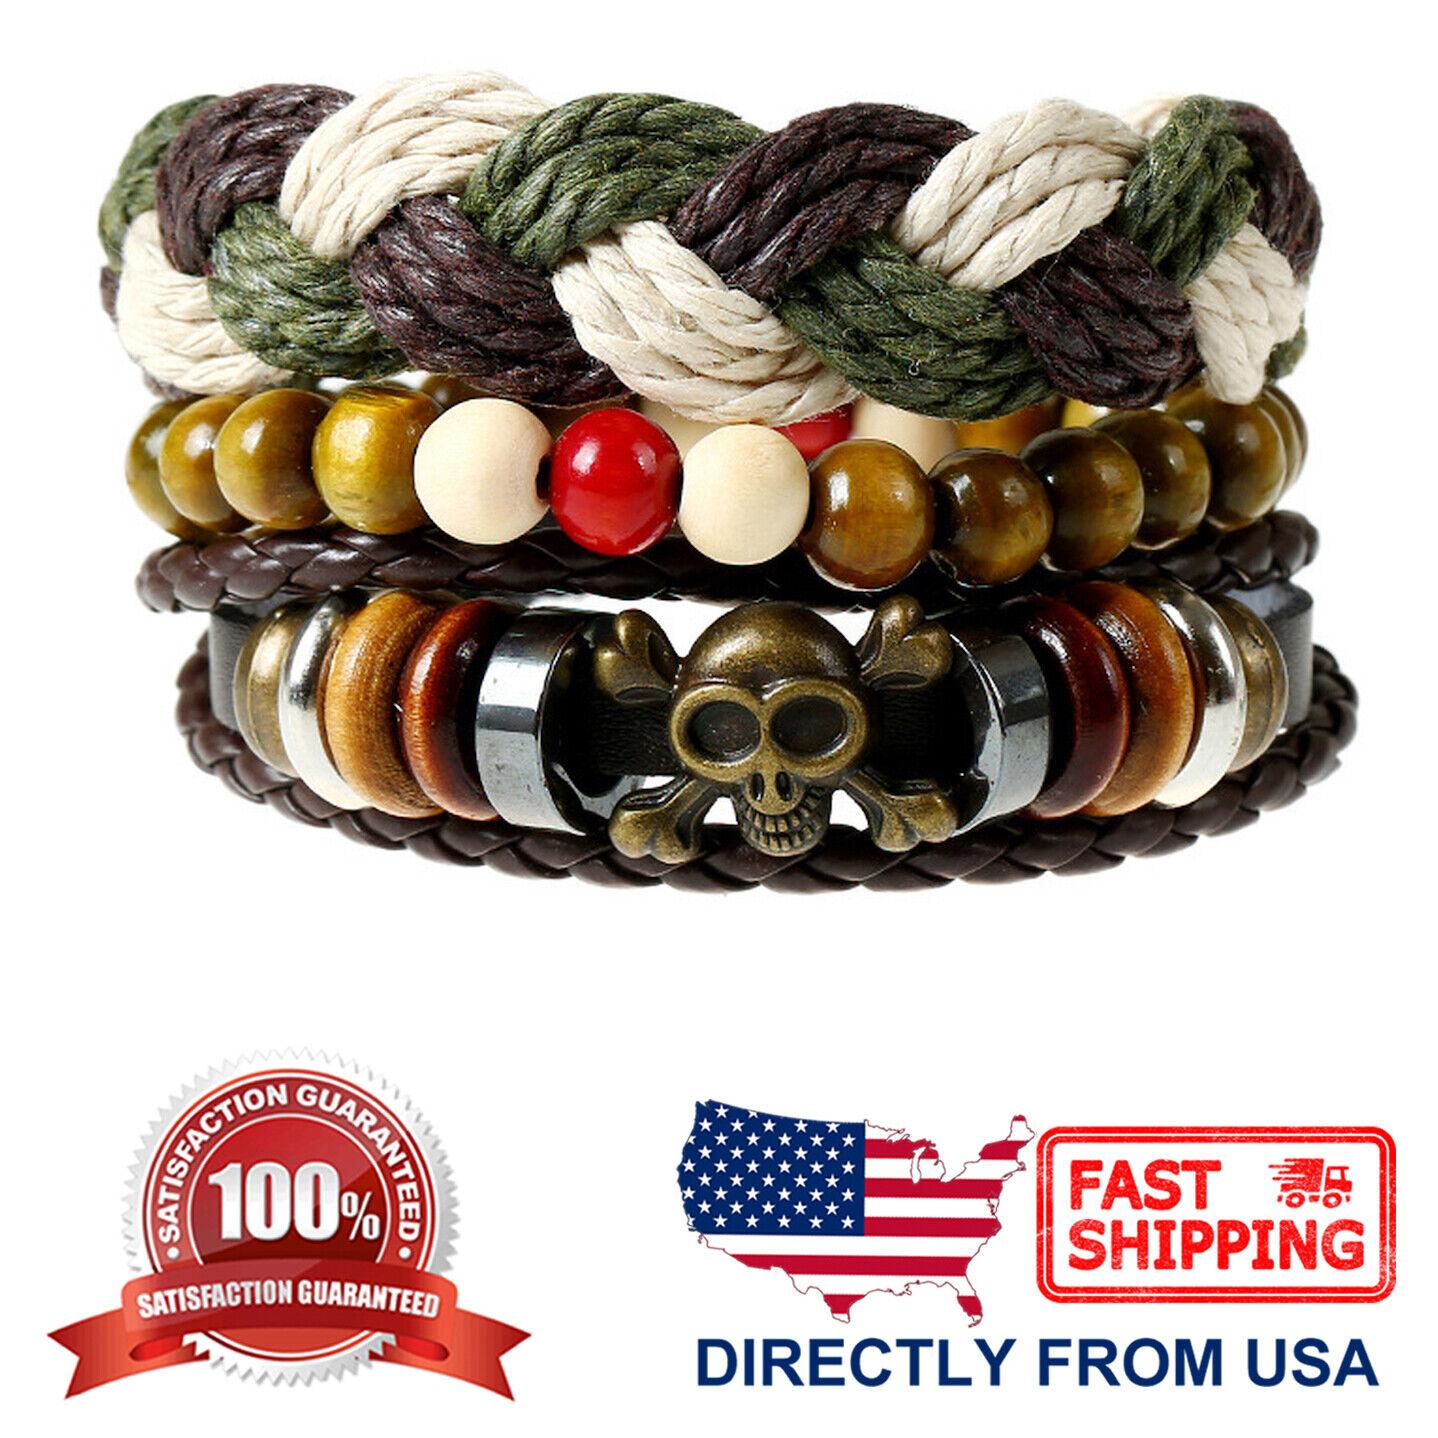 Men's Skull and Tribal Wood Beads Braided Leather 3pcs Set Wristband Bracelet Bracelets